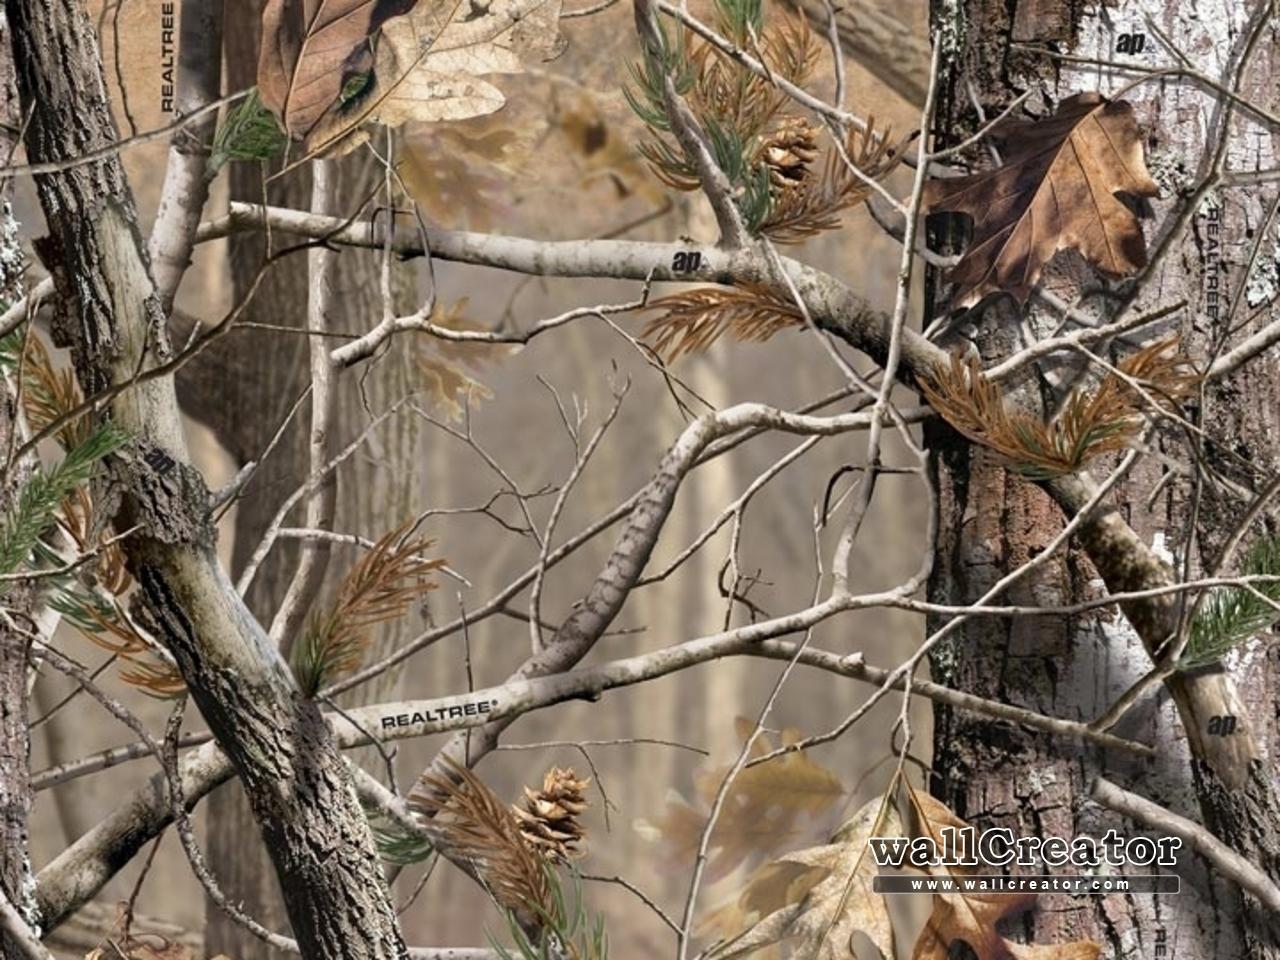 Realtree Camo Wallpaper loopelecom 1280x960